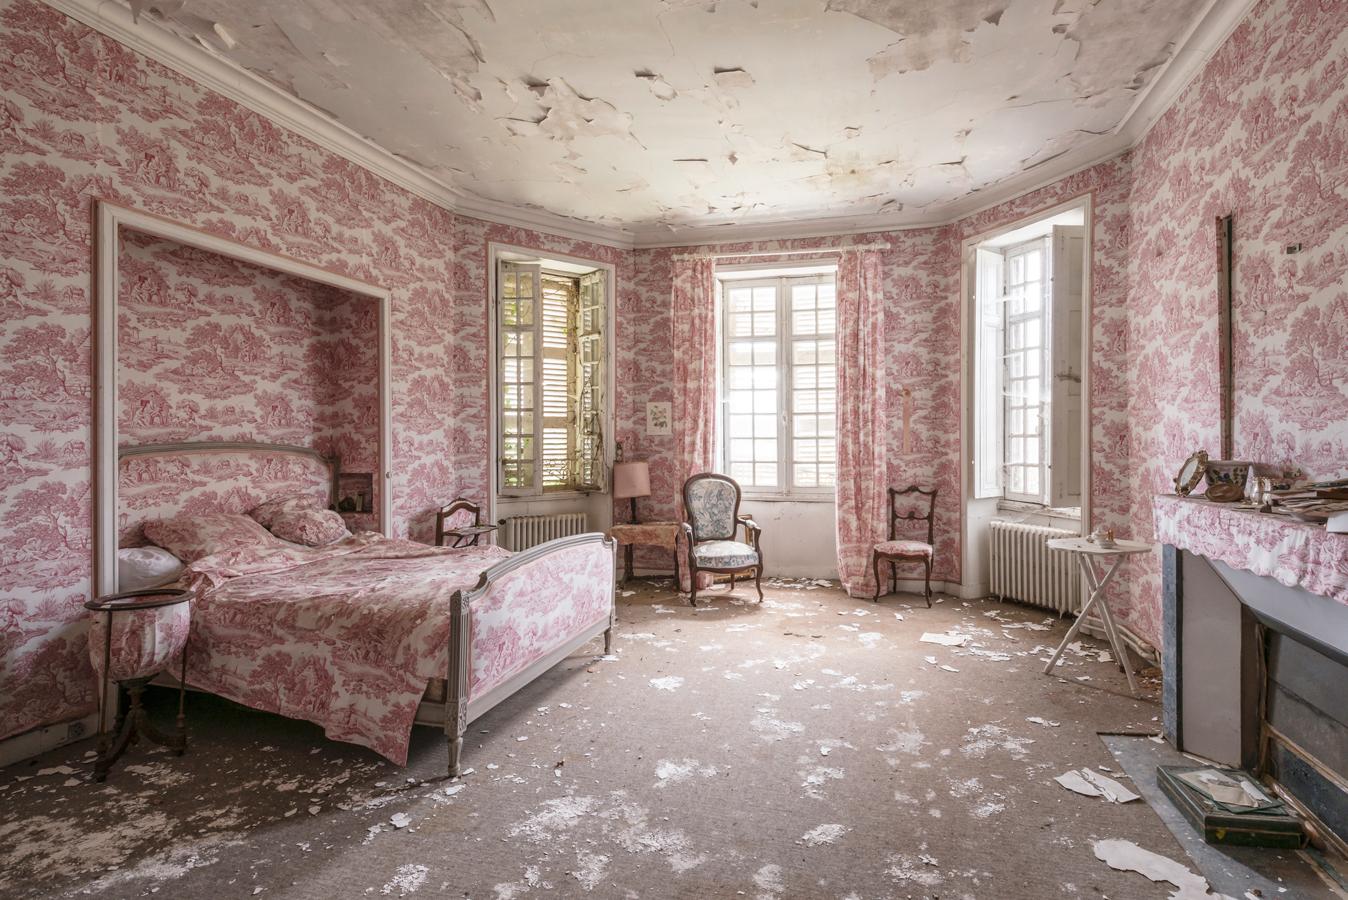 Photographer: Romain Veillon & Abandoned Spaces Around the World